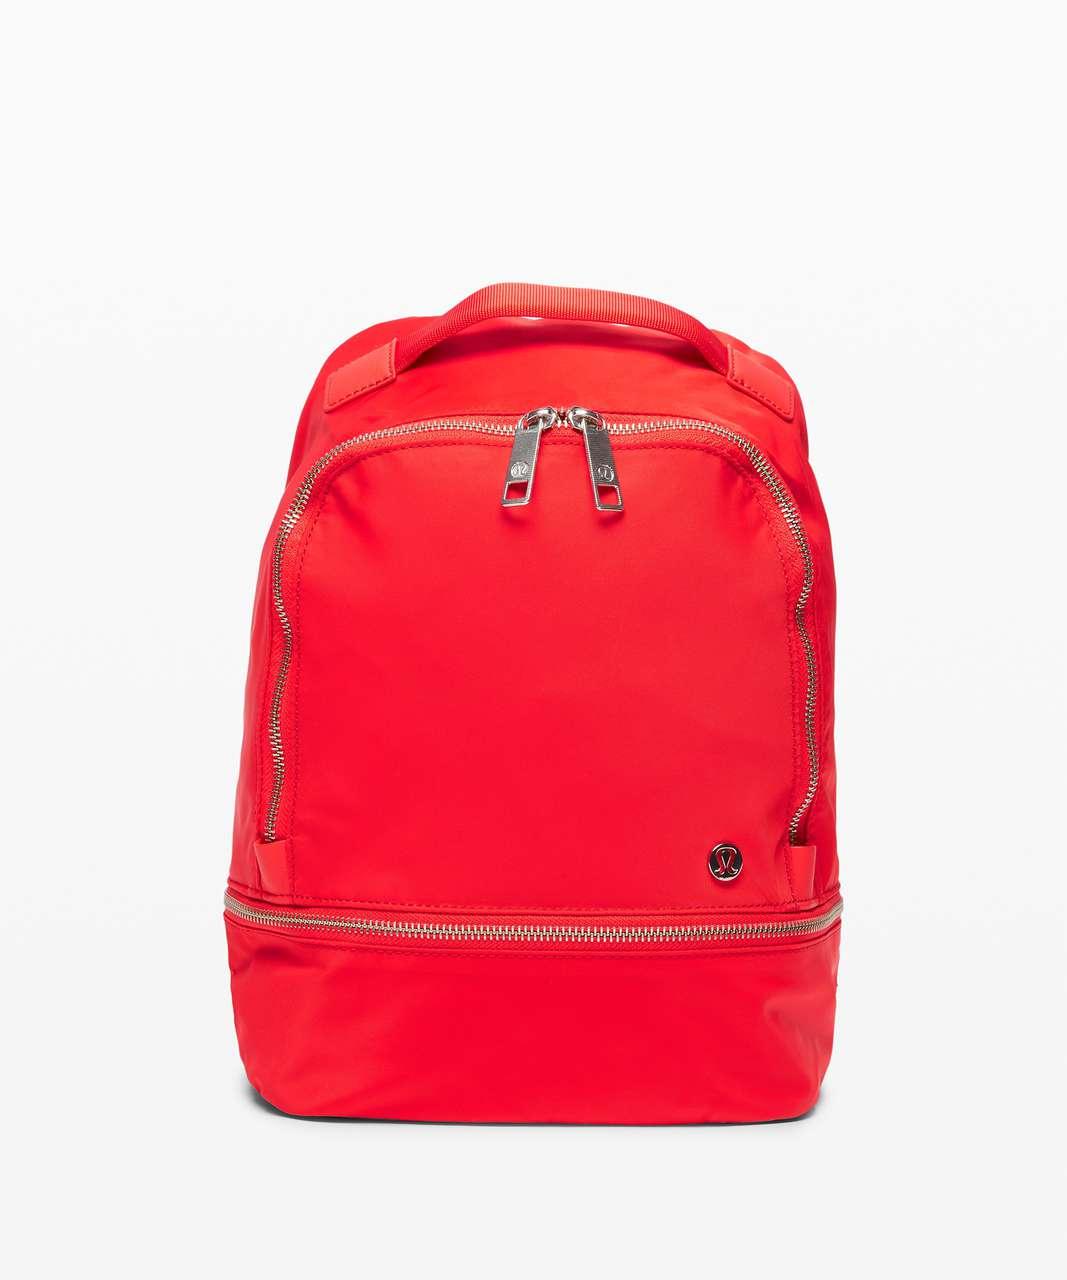 Lululemon City Adventurer Backpack Mini *10L - Carnation Red